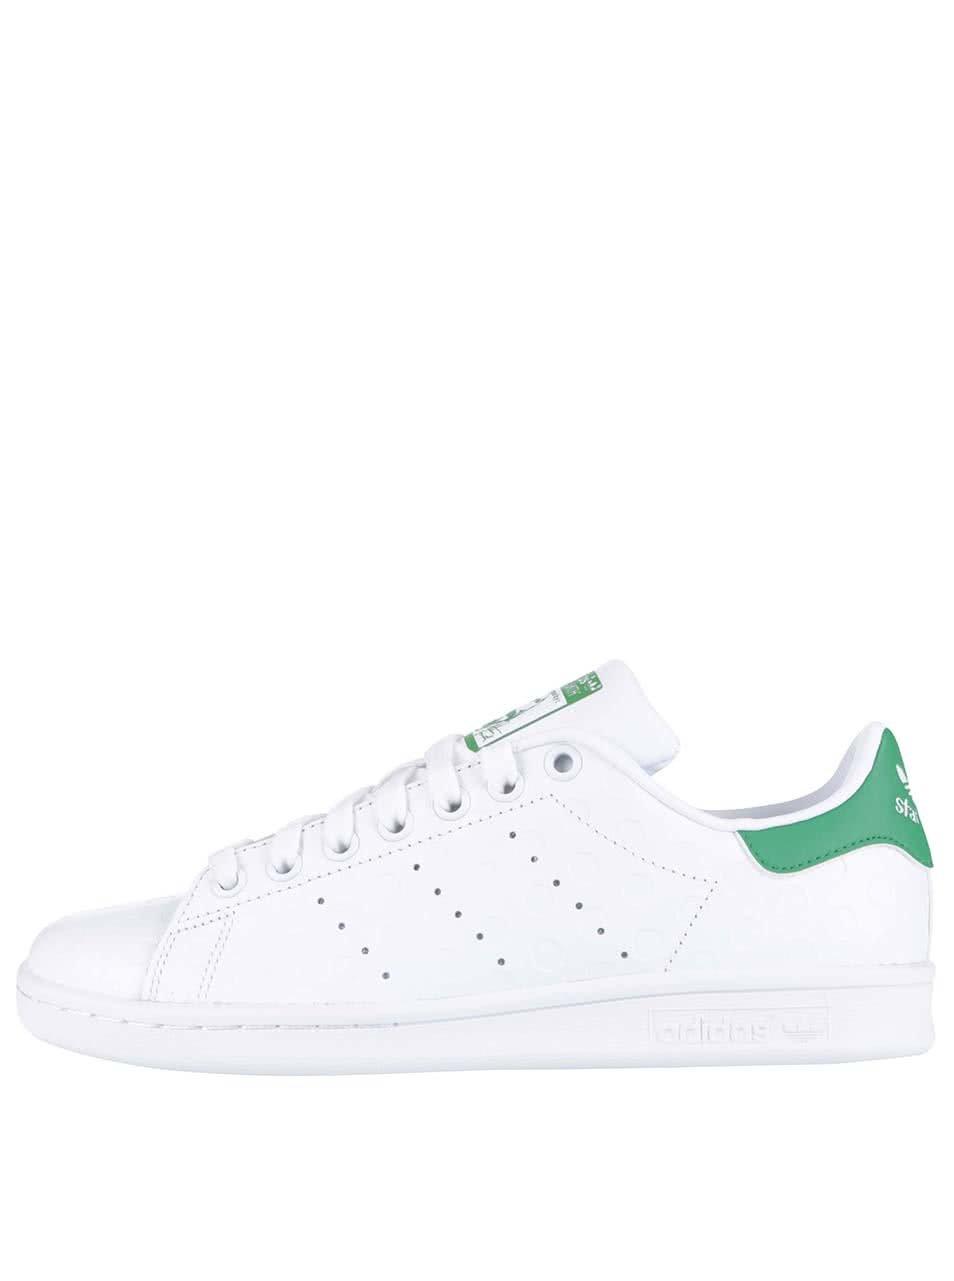 Bílé dámské kožené tenisky s plastickým vzorem adidas Originals Stan Smith  ... f0f568d984